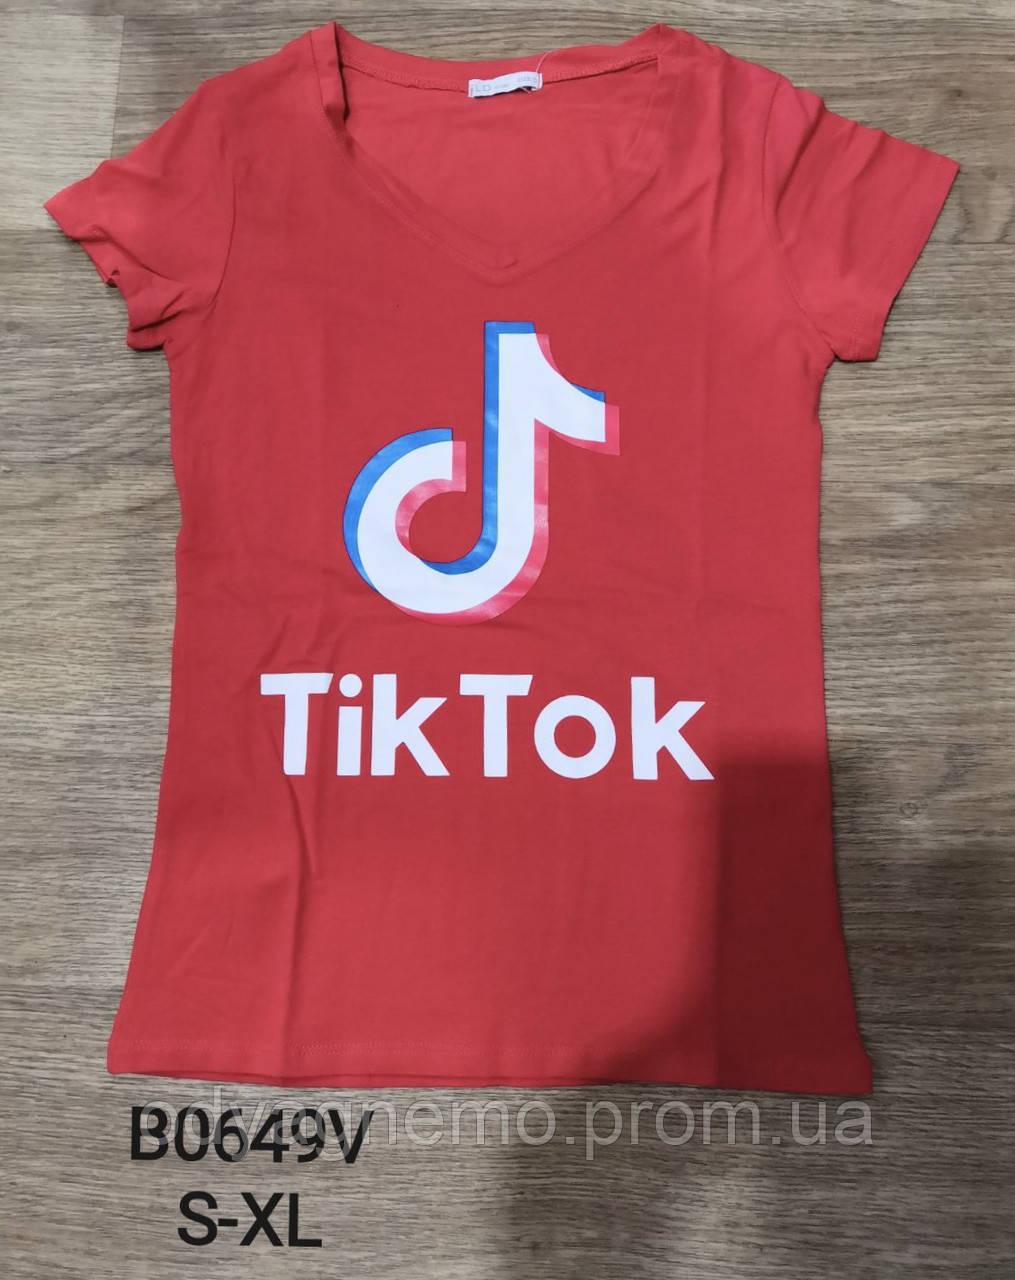 Футболка женская Tik Tok Glo-story , S-XL рр. Артикул: WPO-B0649V